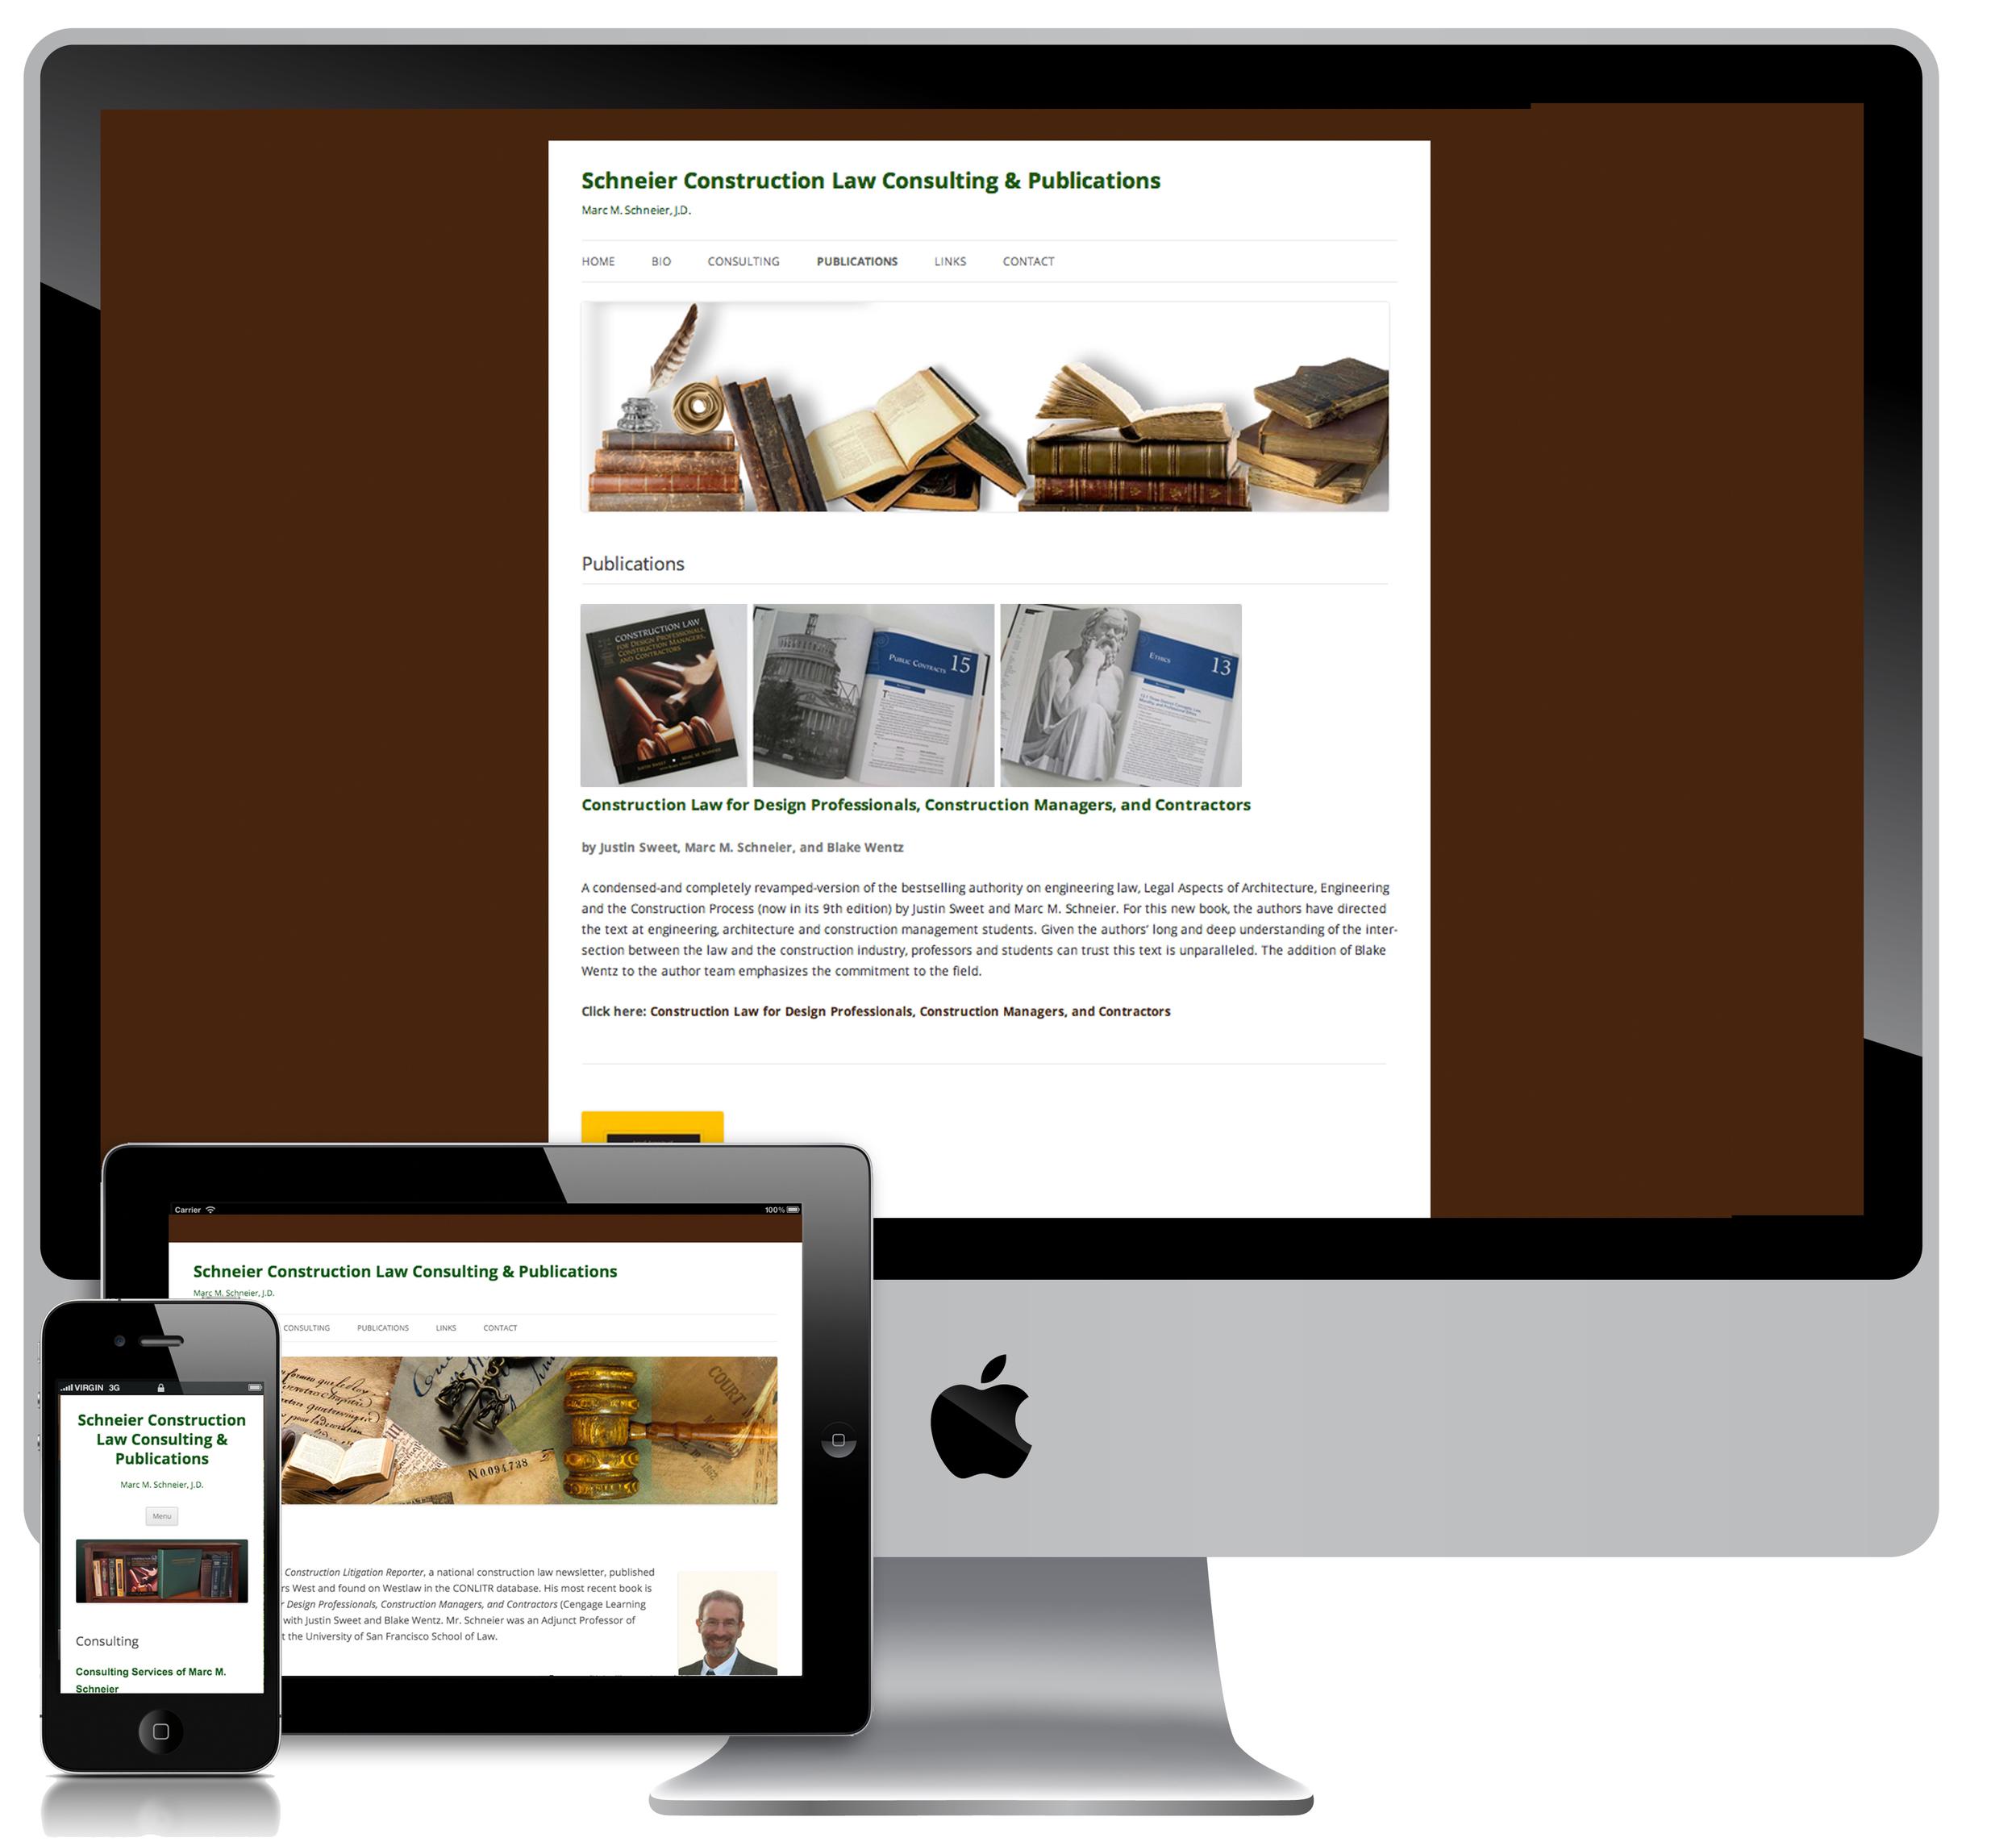 buildinglaw-template_publications.png